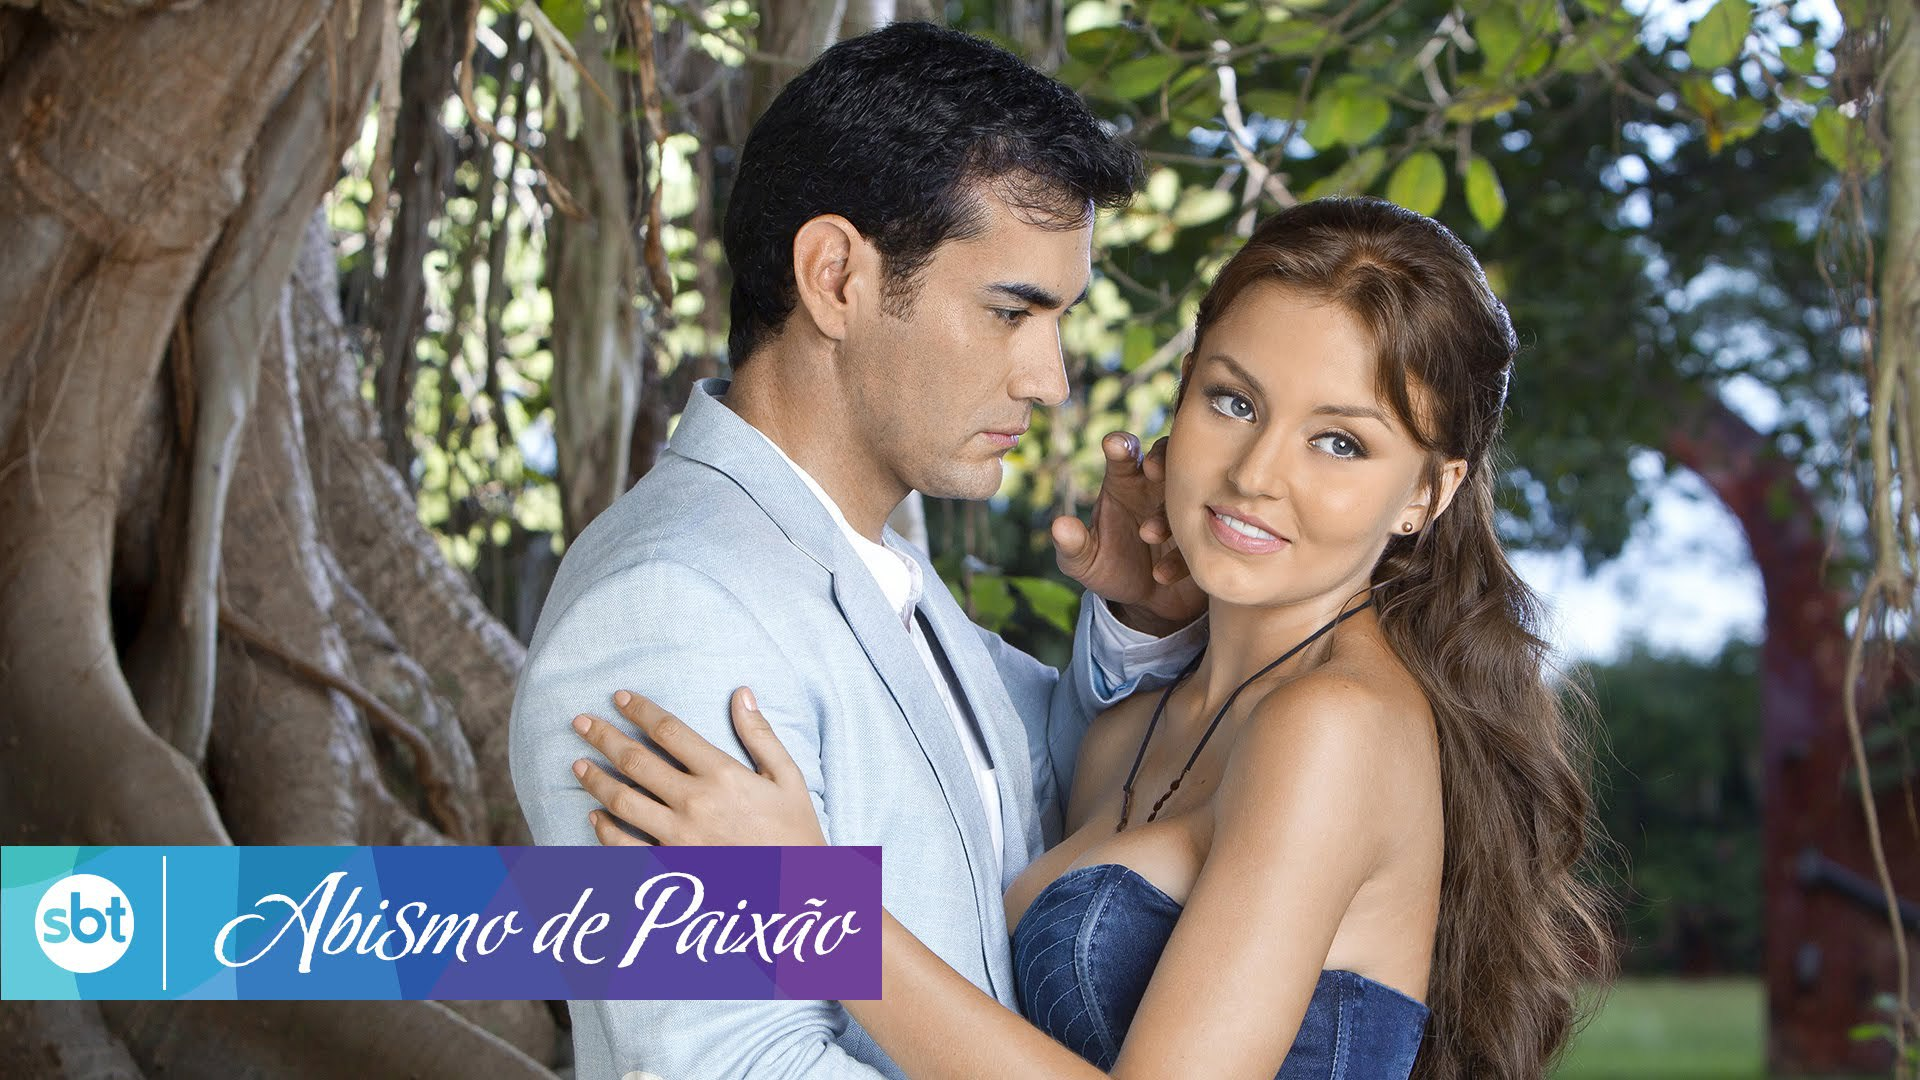 Abismo de pasion 145 online dating 4